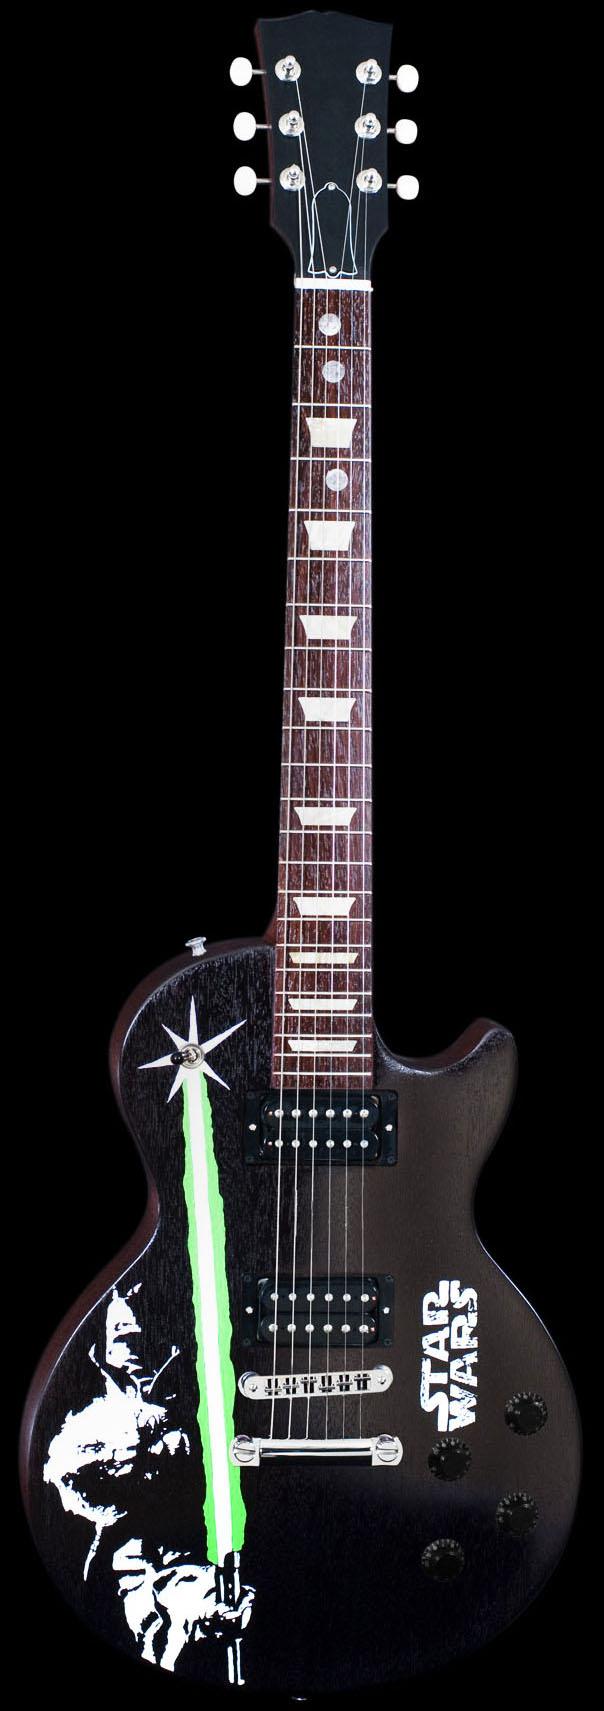 guitarestarwars.jpg